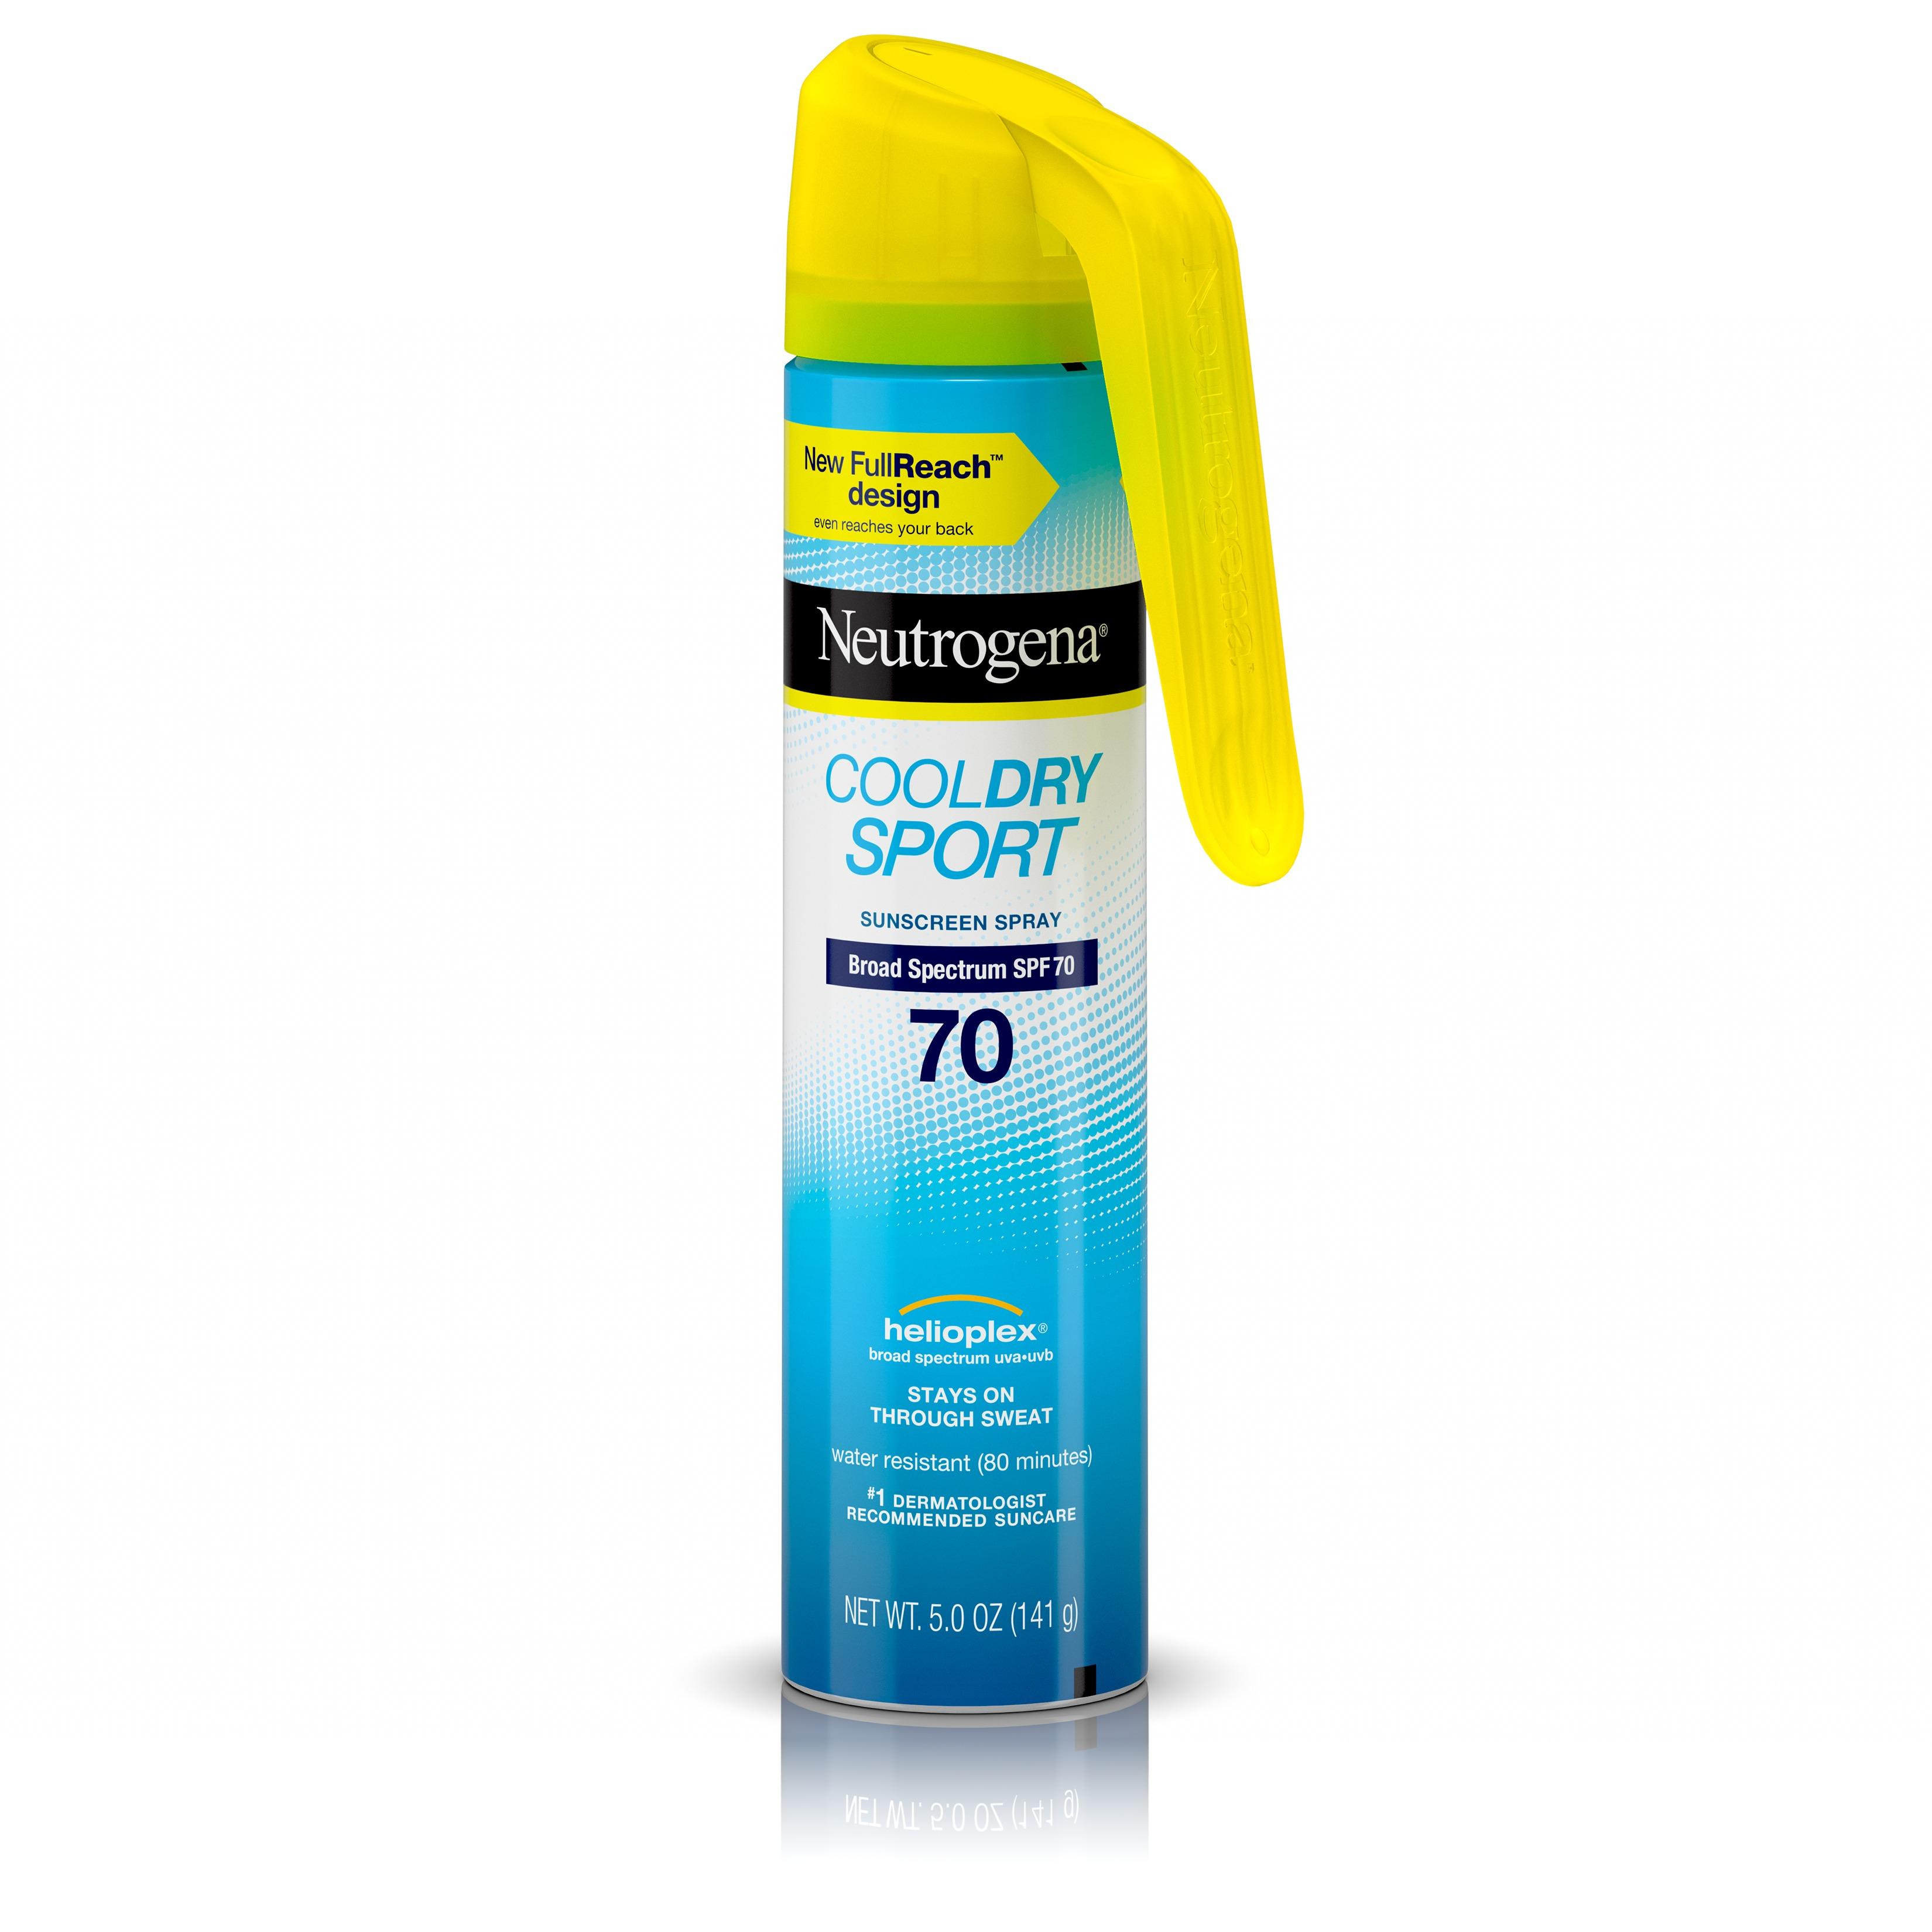 Neutrogena CoolDry Sport Water-Resistant Sunscreen Spray, SPF 70, 5 oz